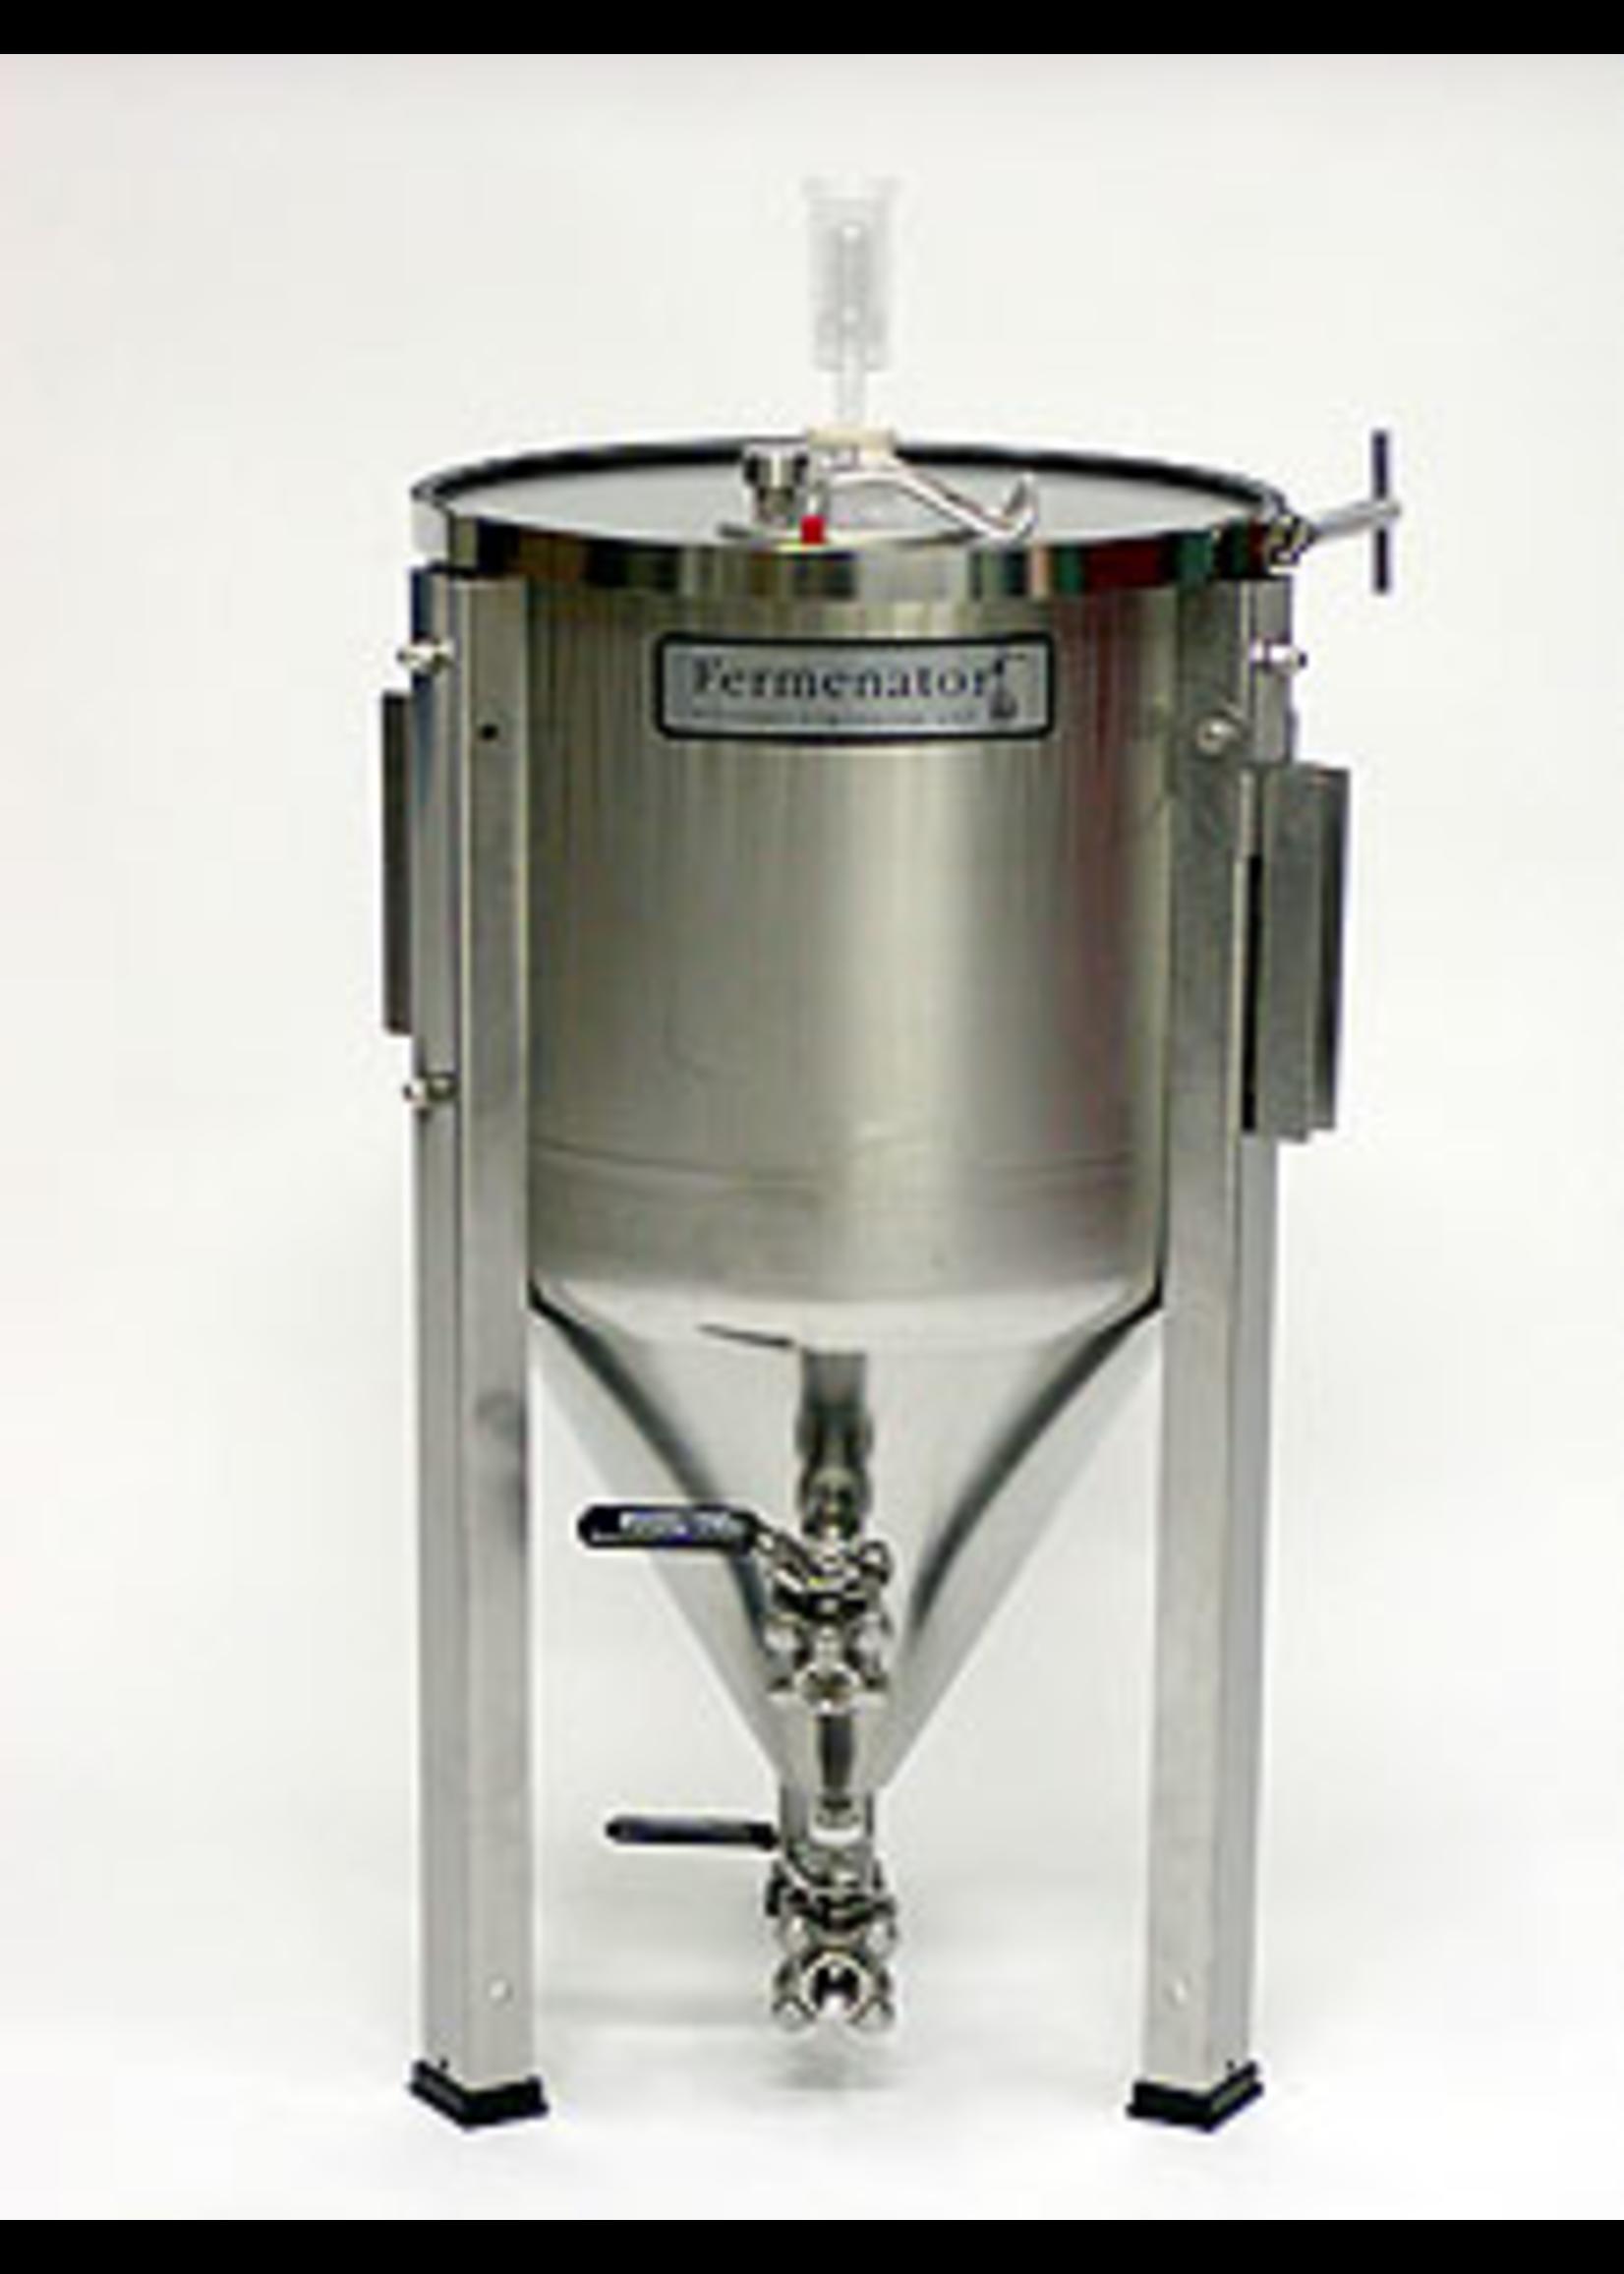 Blichmann Blichmann Fermenator - Conical Fermentor - 7 Gallon with NPT Fittings